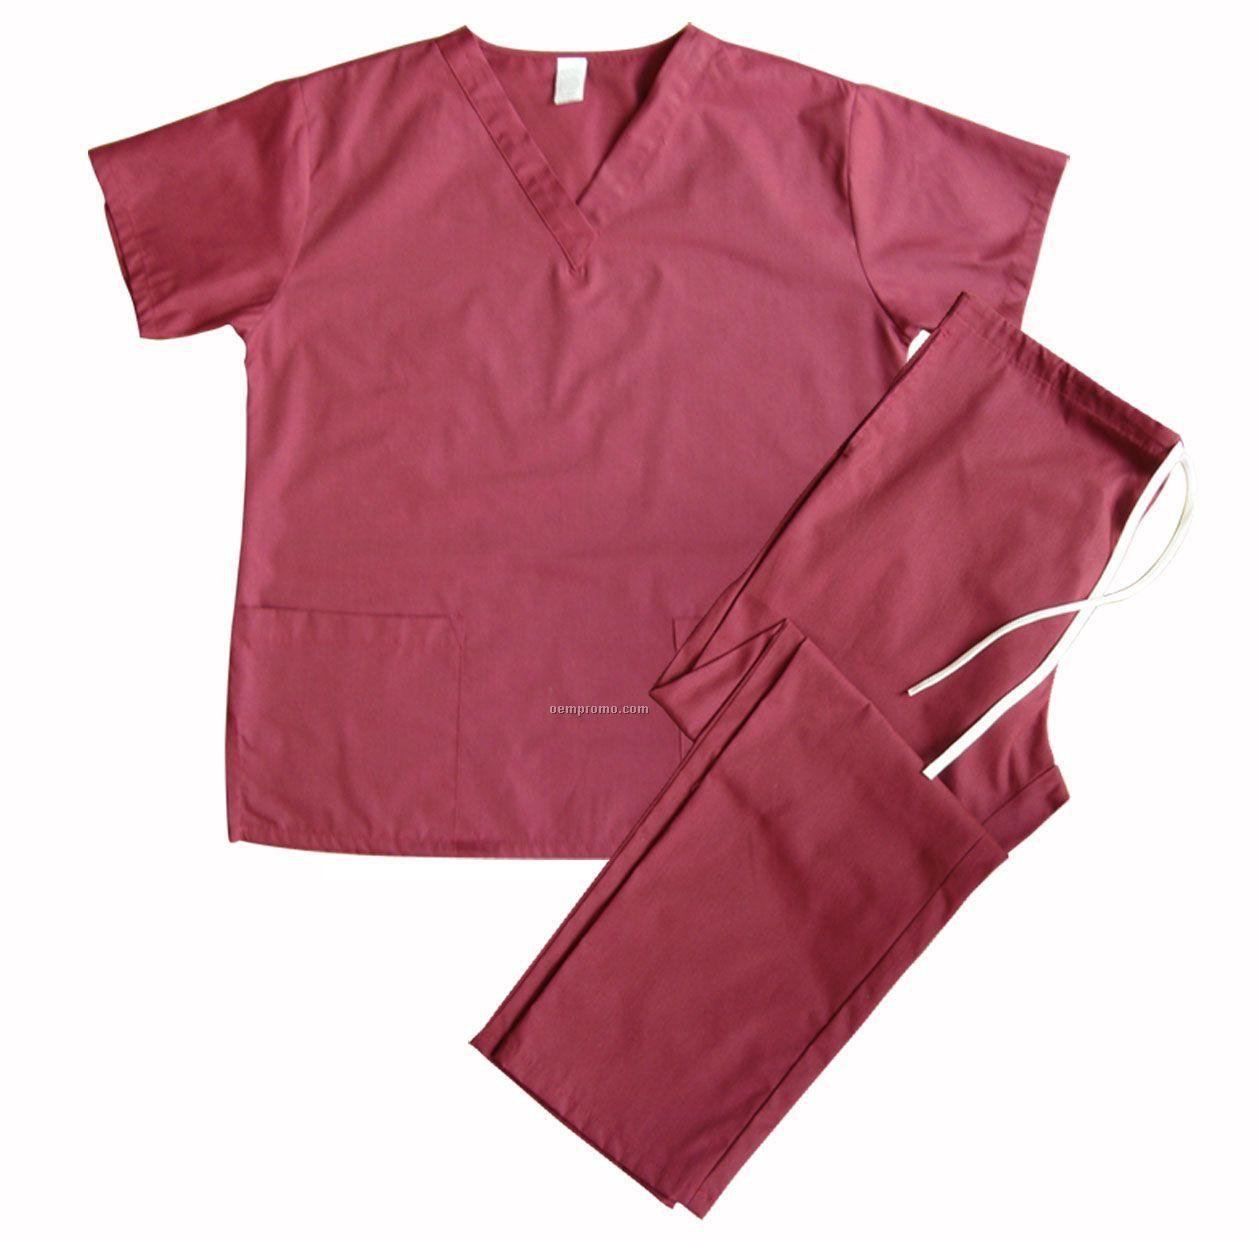 Made In U.s.a. 2-pocket Scrub Set (Xs-xl)